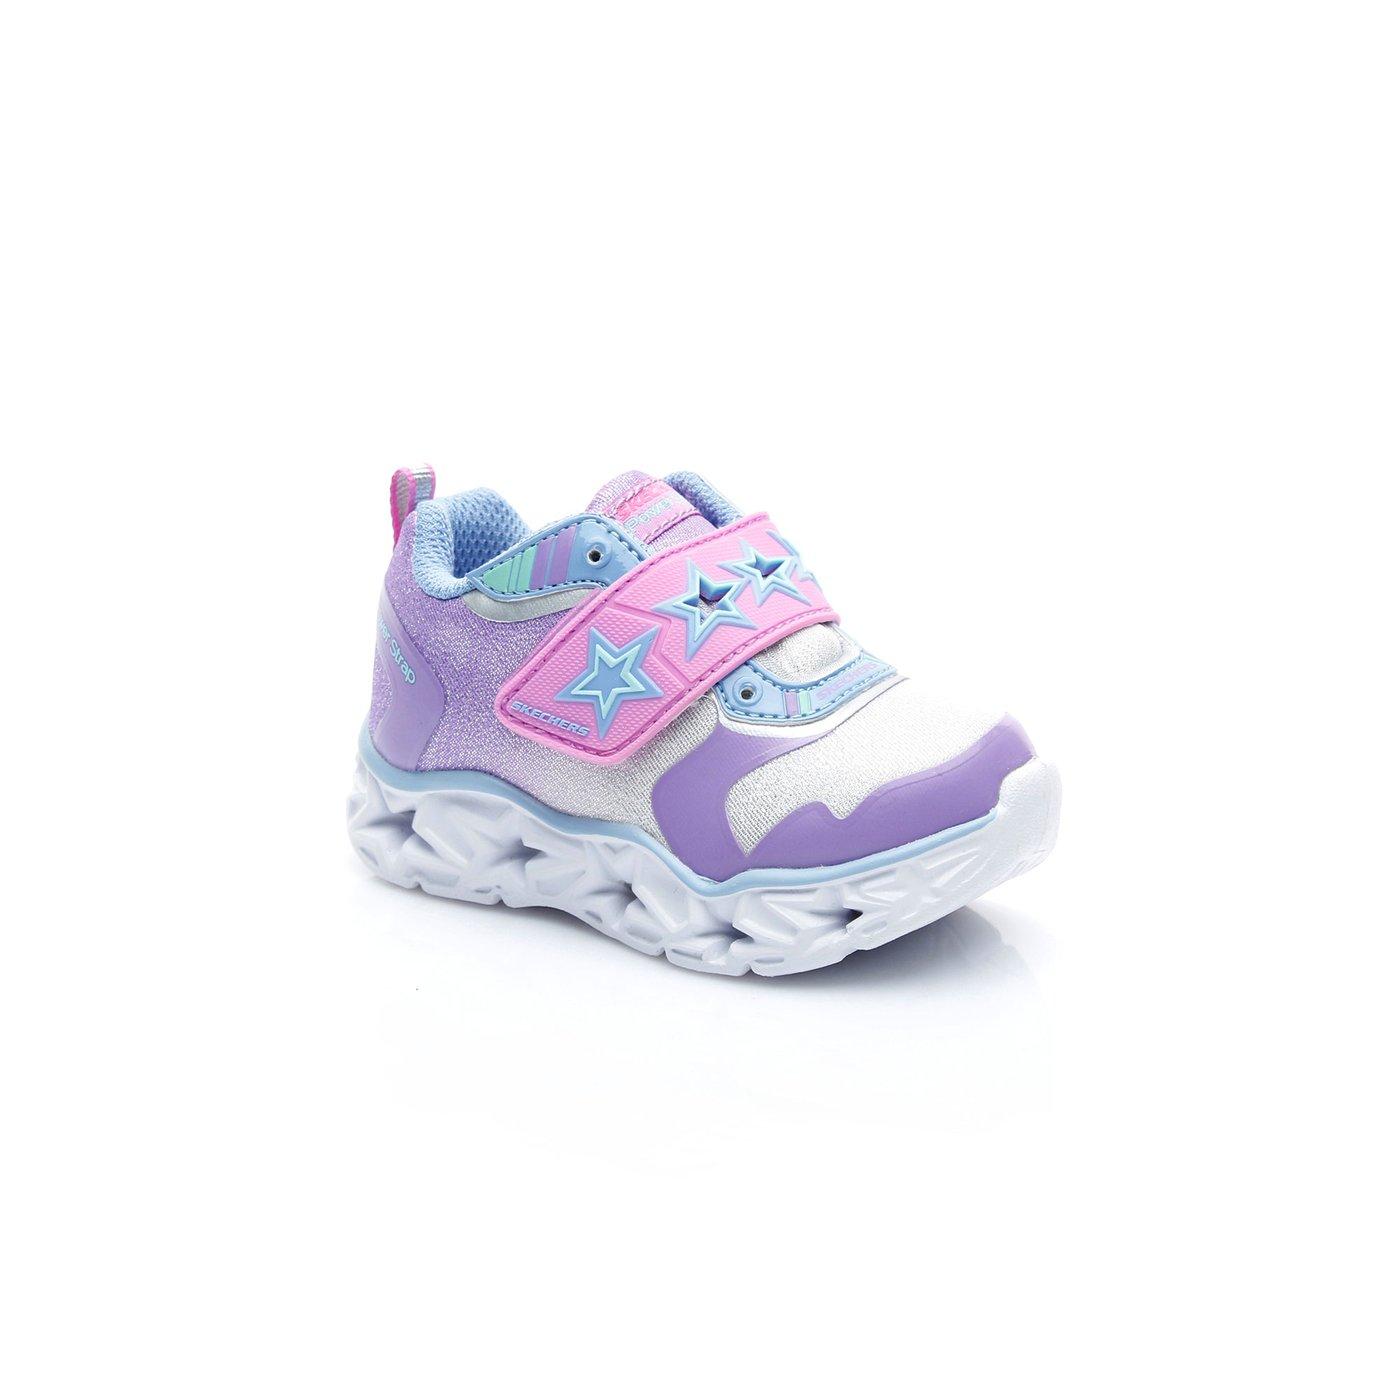 Skechers Galaxy Lights - Cosmic Kick Çocuk Gümüş Sneaker